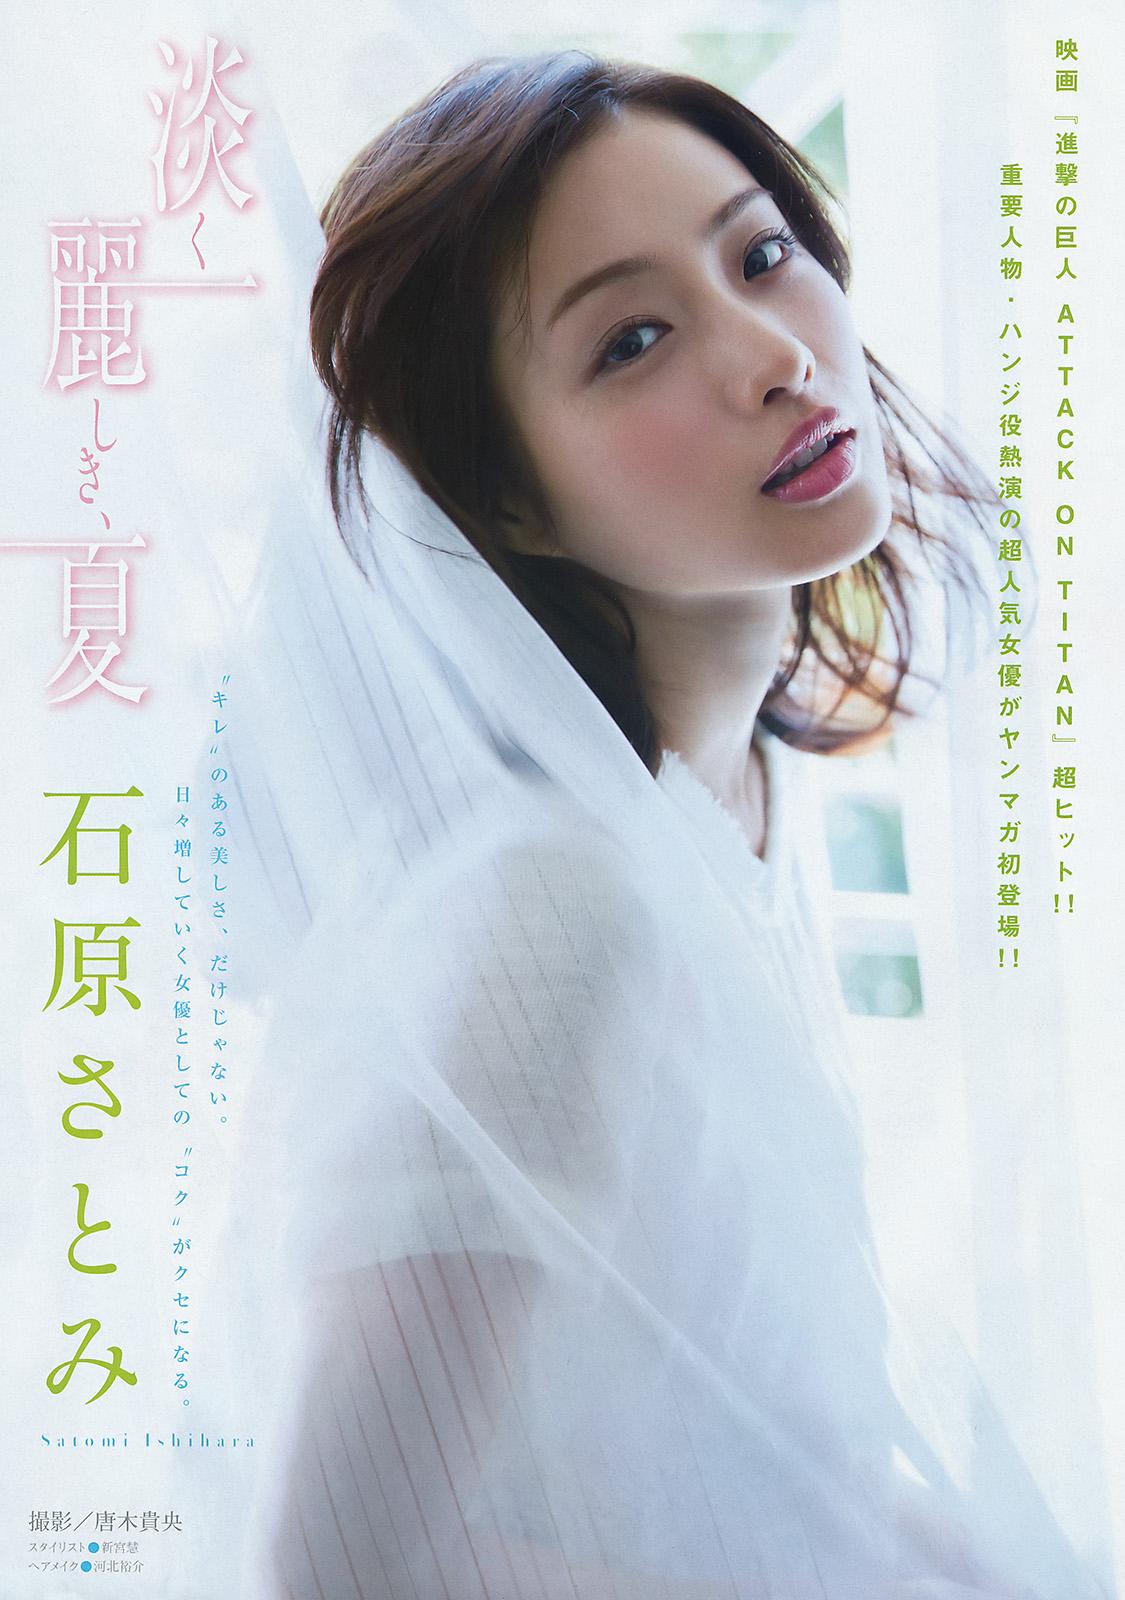 http://upimg.tokimeki-s.com/2015/08/55ca2278c2661.jpg